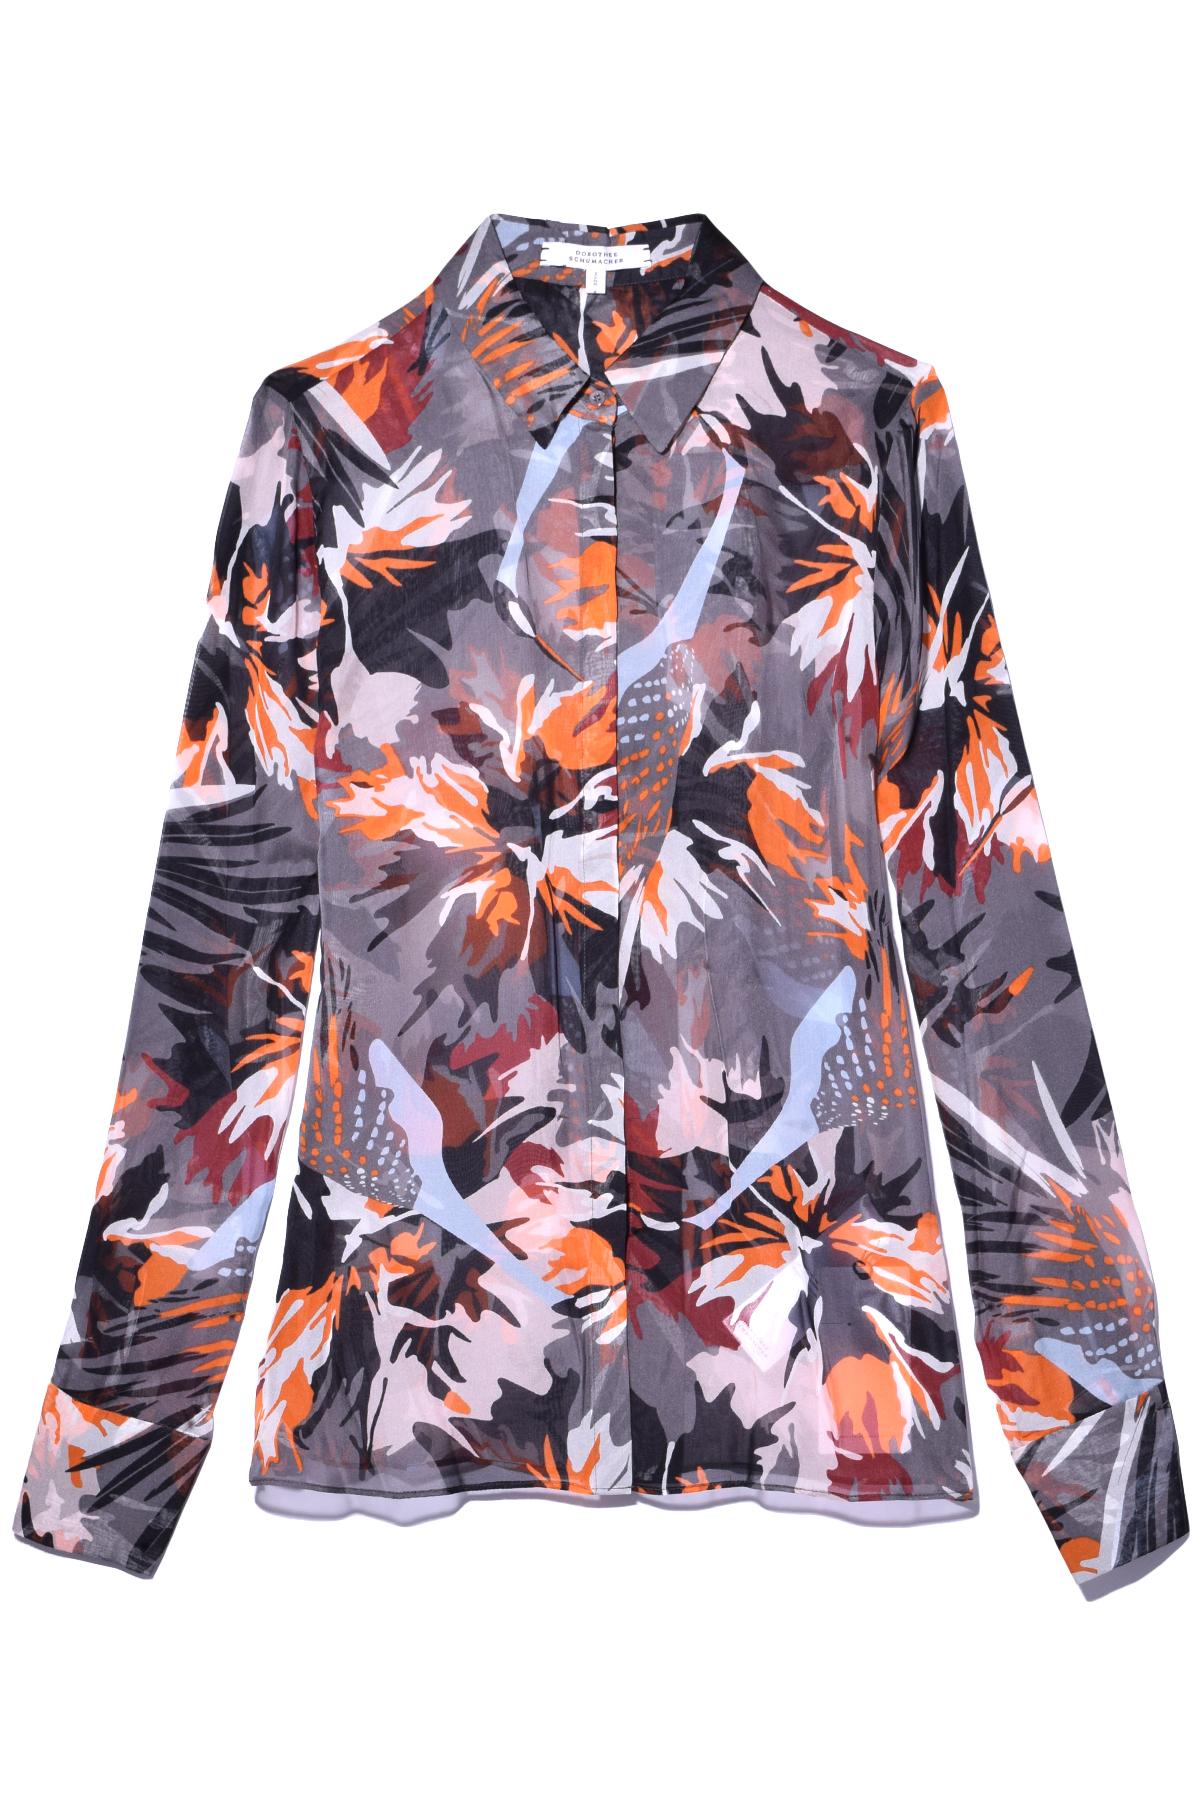 lyst dorothee schumacher wild feathers blouse in wild orange in blue. Black Bedroom Furniture Sets. Home Design Ideas